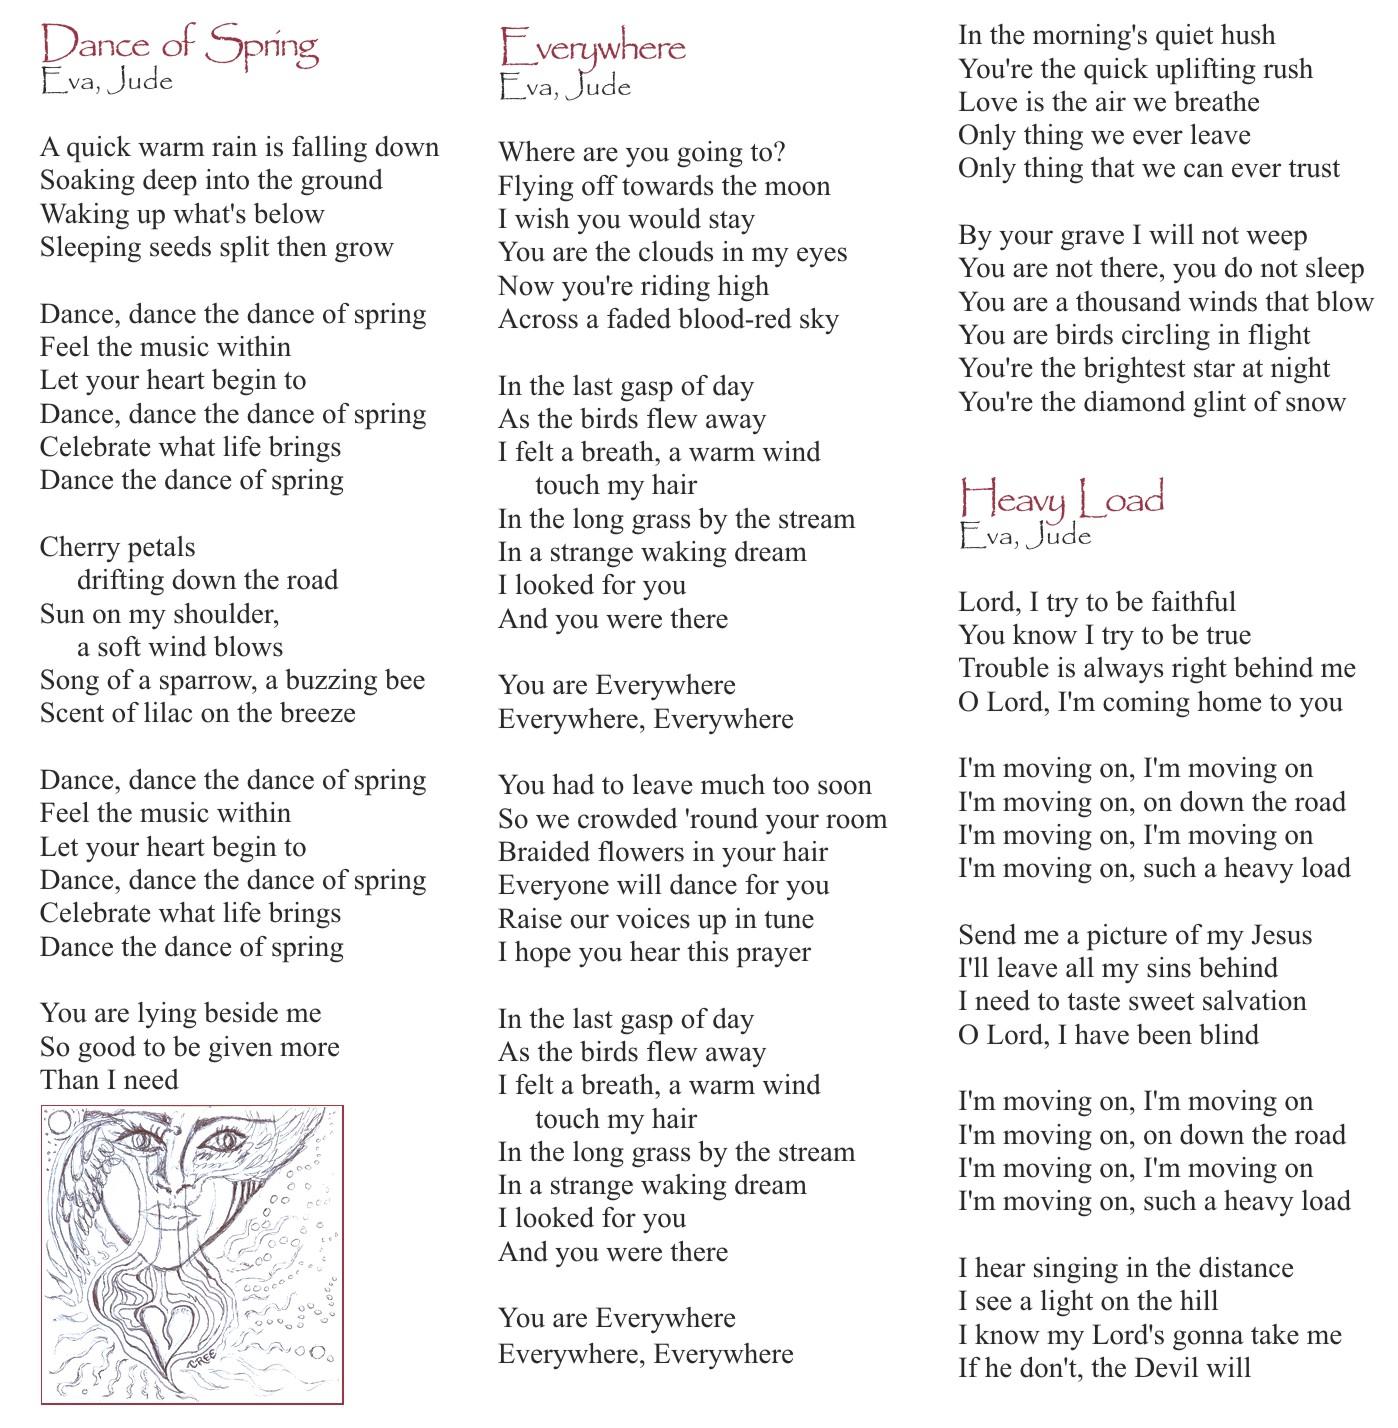 Eva Tree – Music of Eva Tree